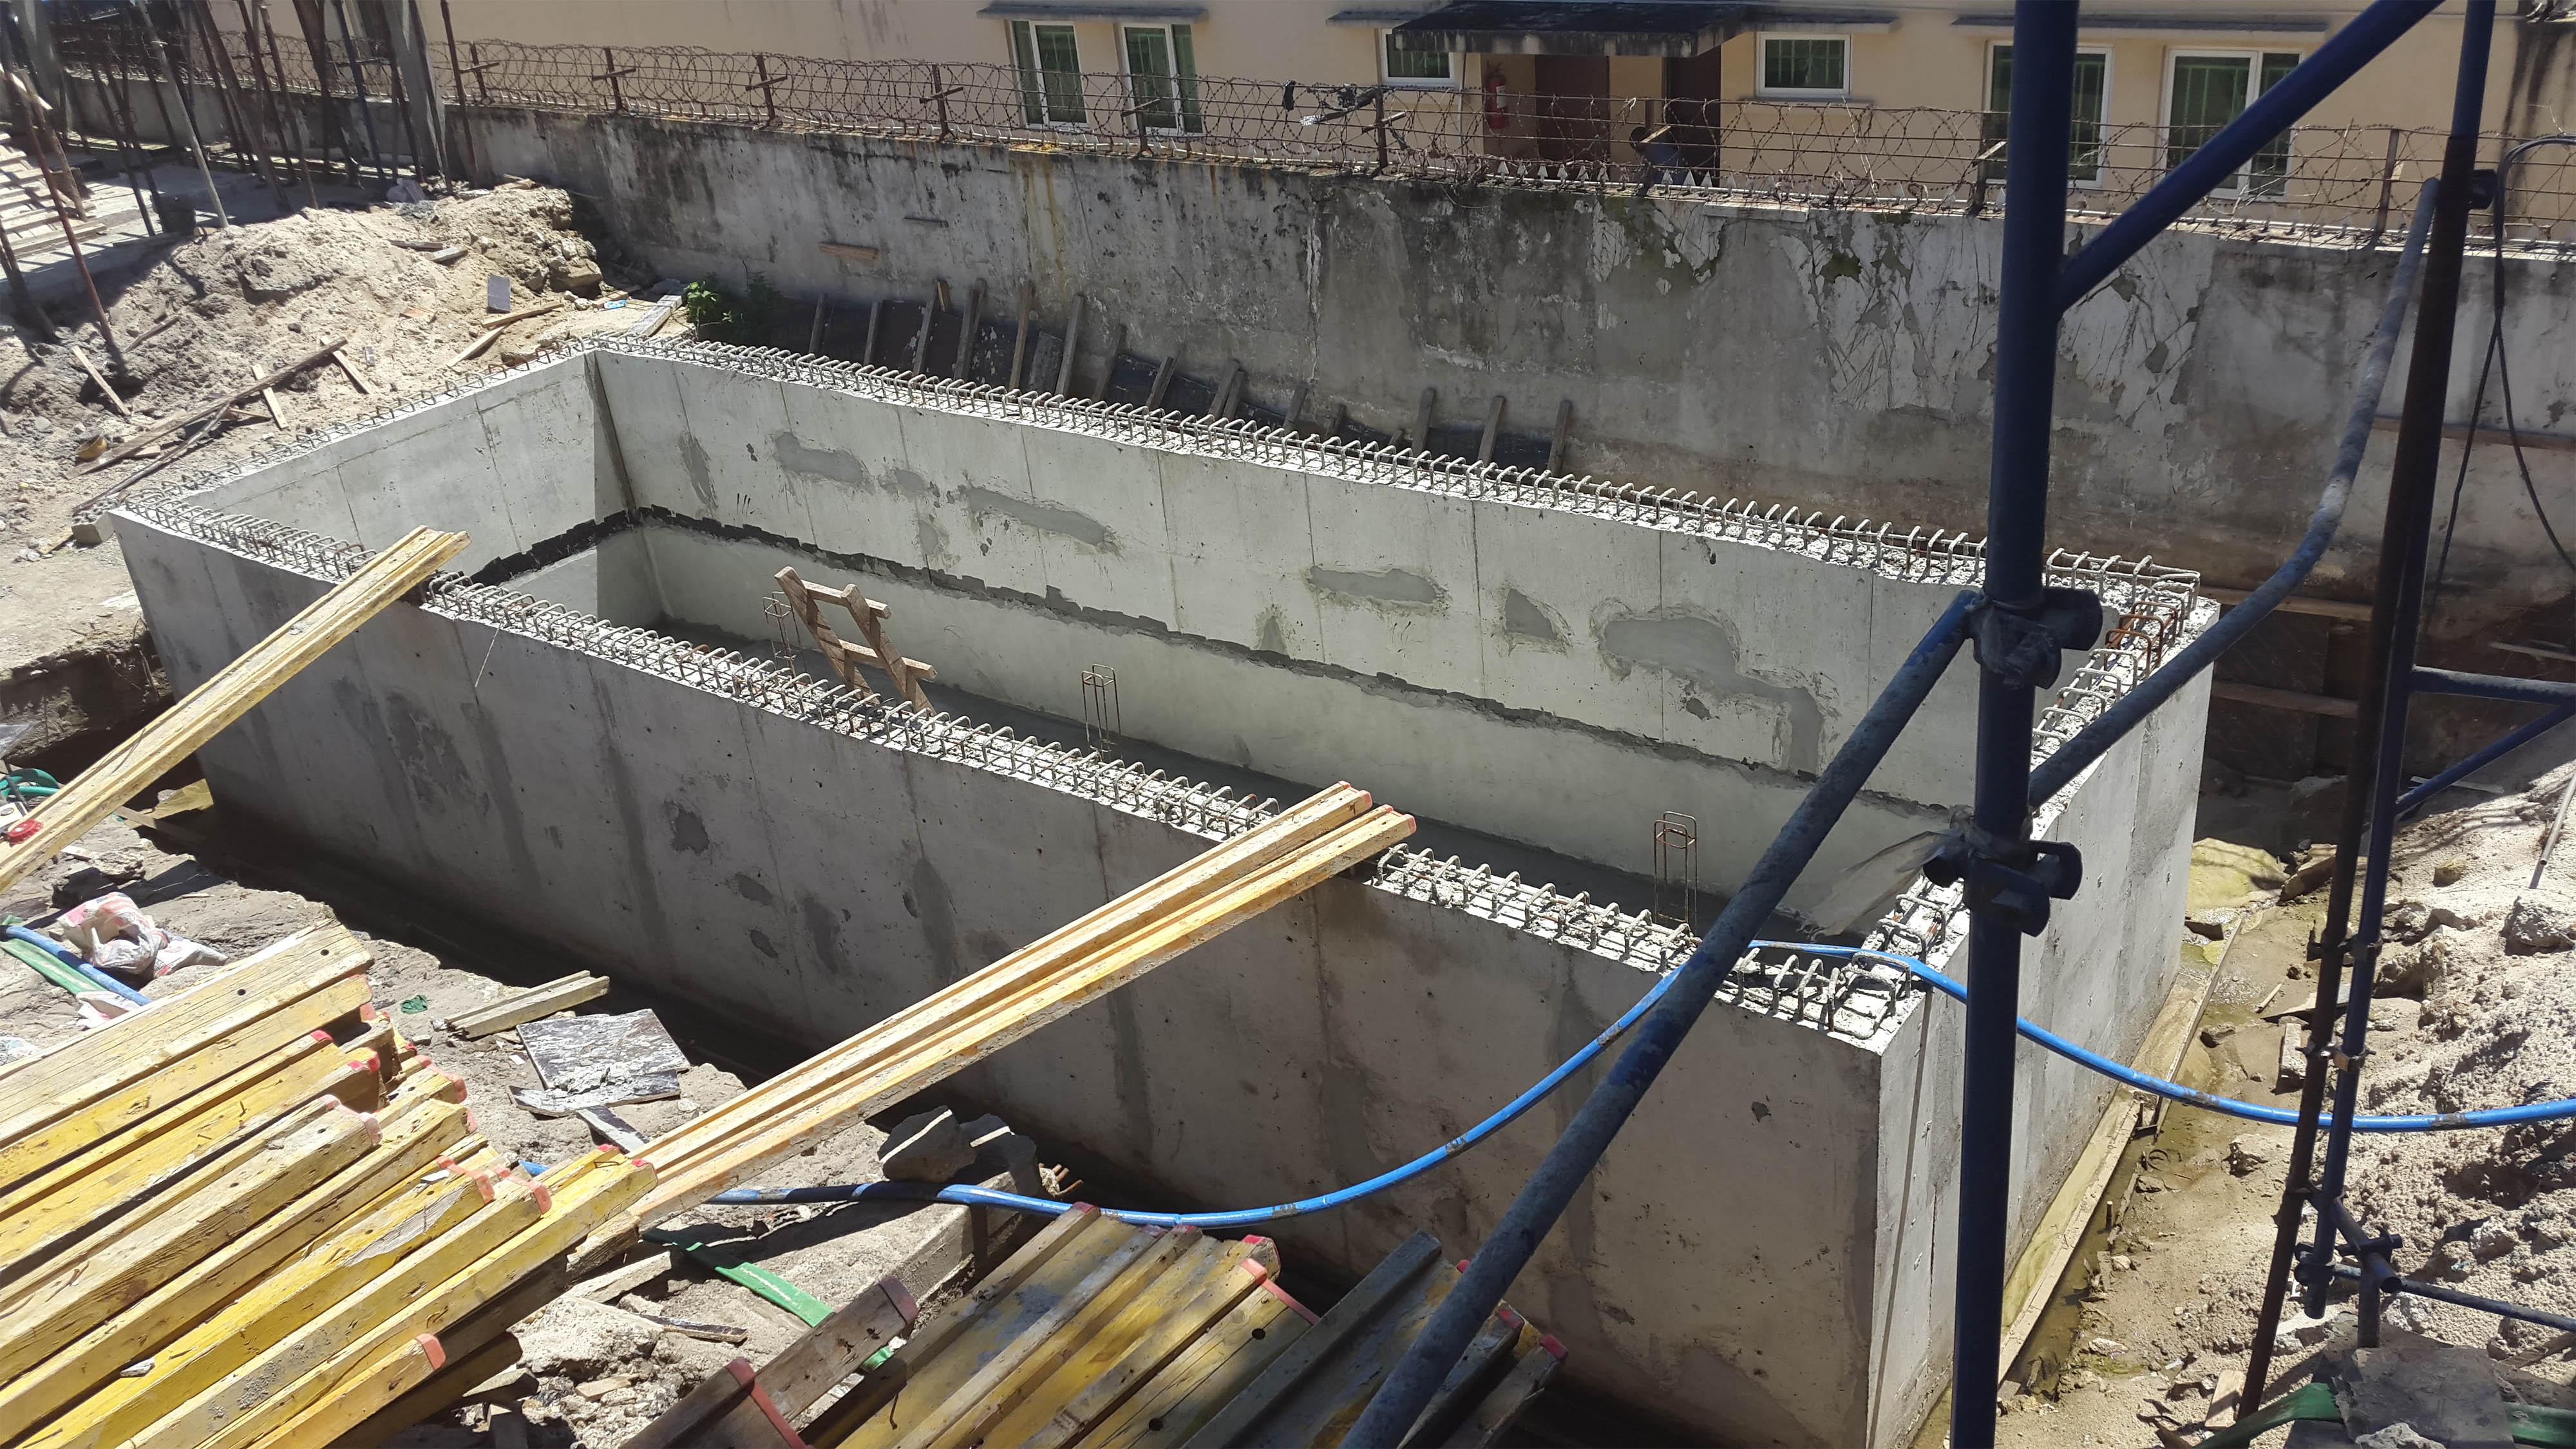 Water Tank Waterproofing : Aquafin krystal admix concrete waterproofing of waste